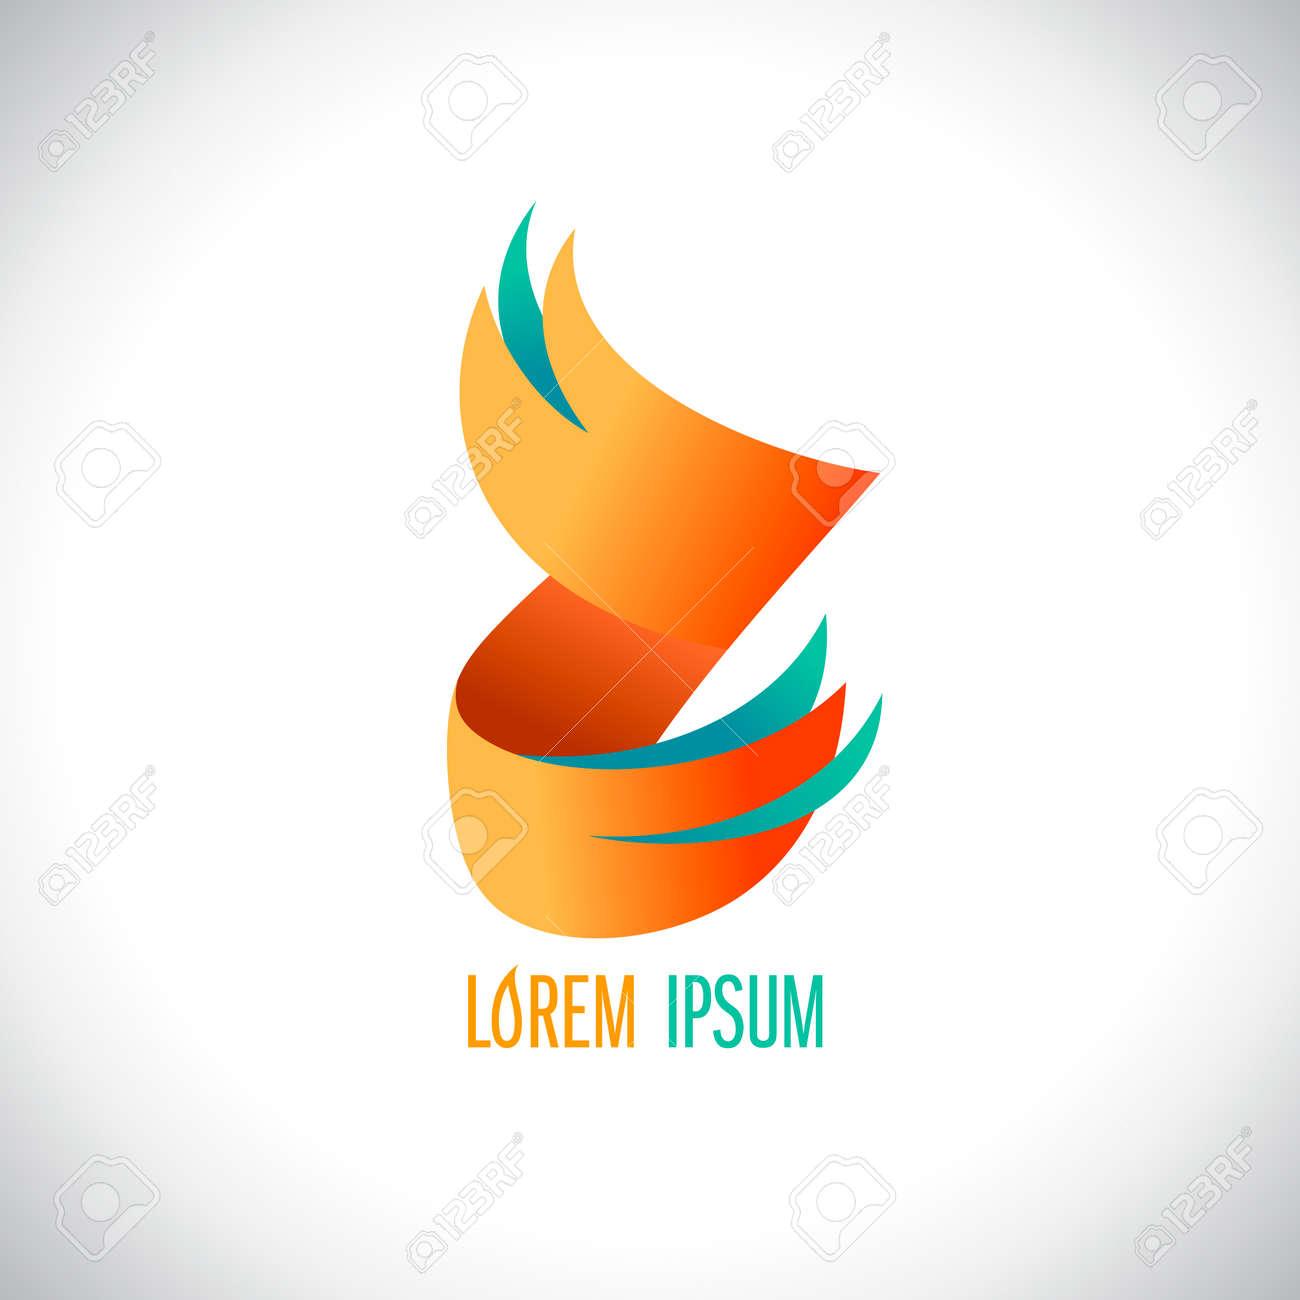 Abstract Z Letter Symbol Logo Design